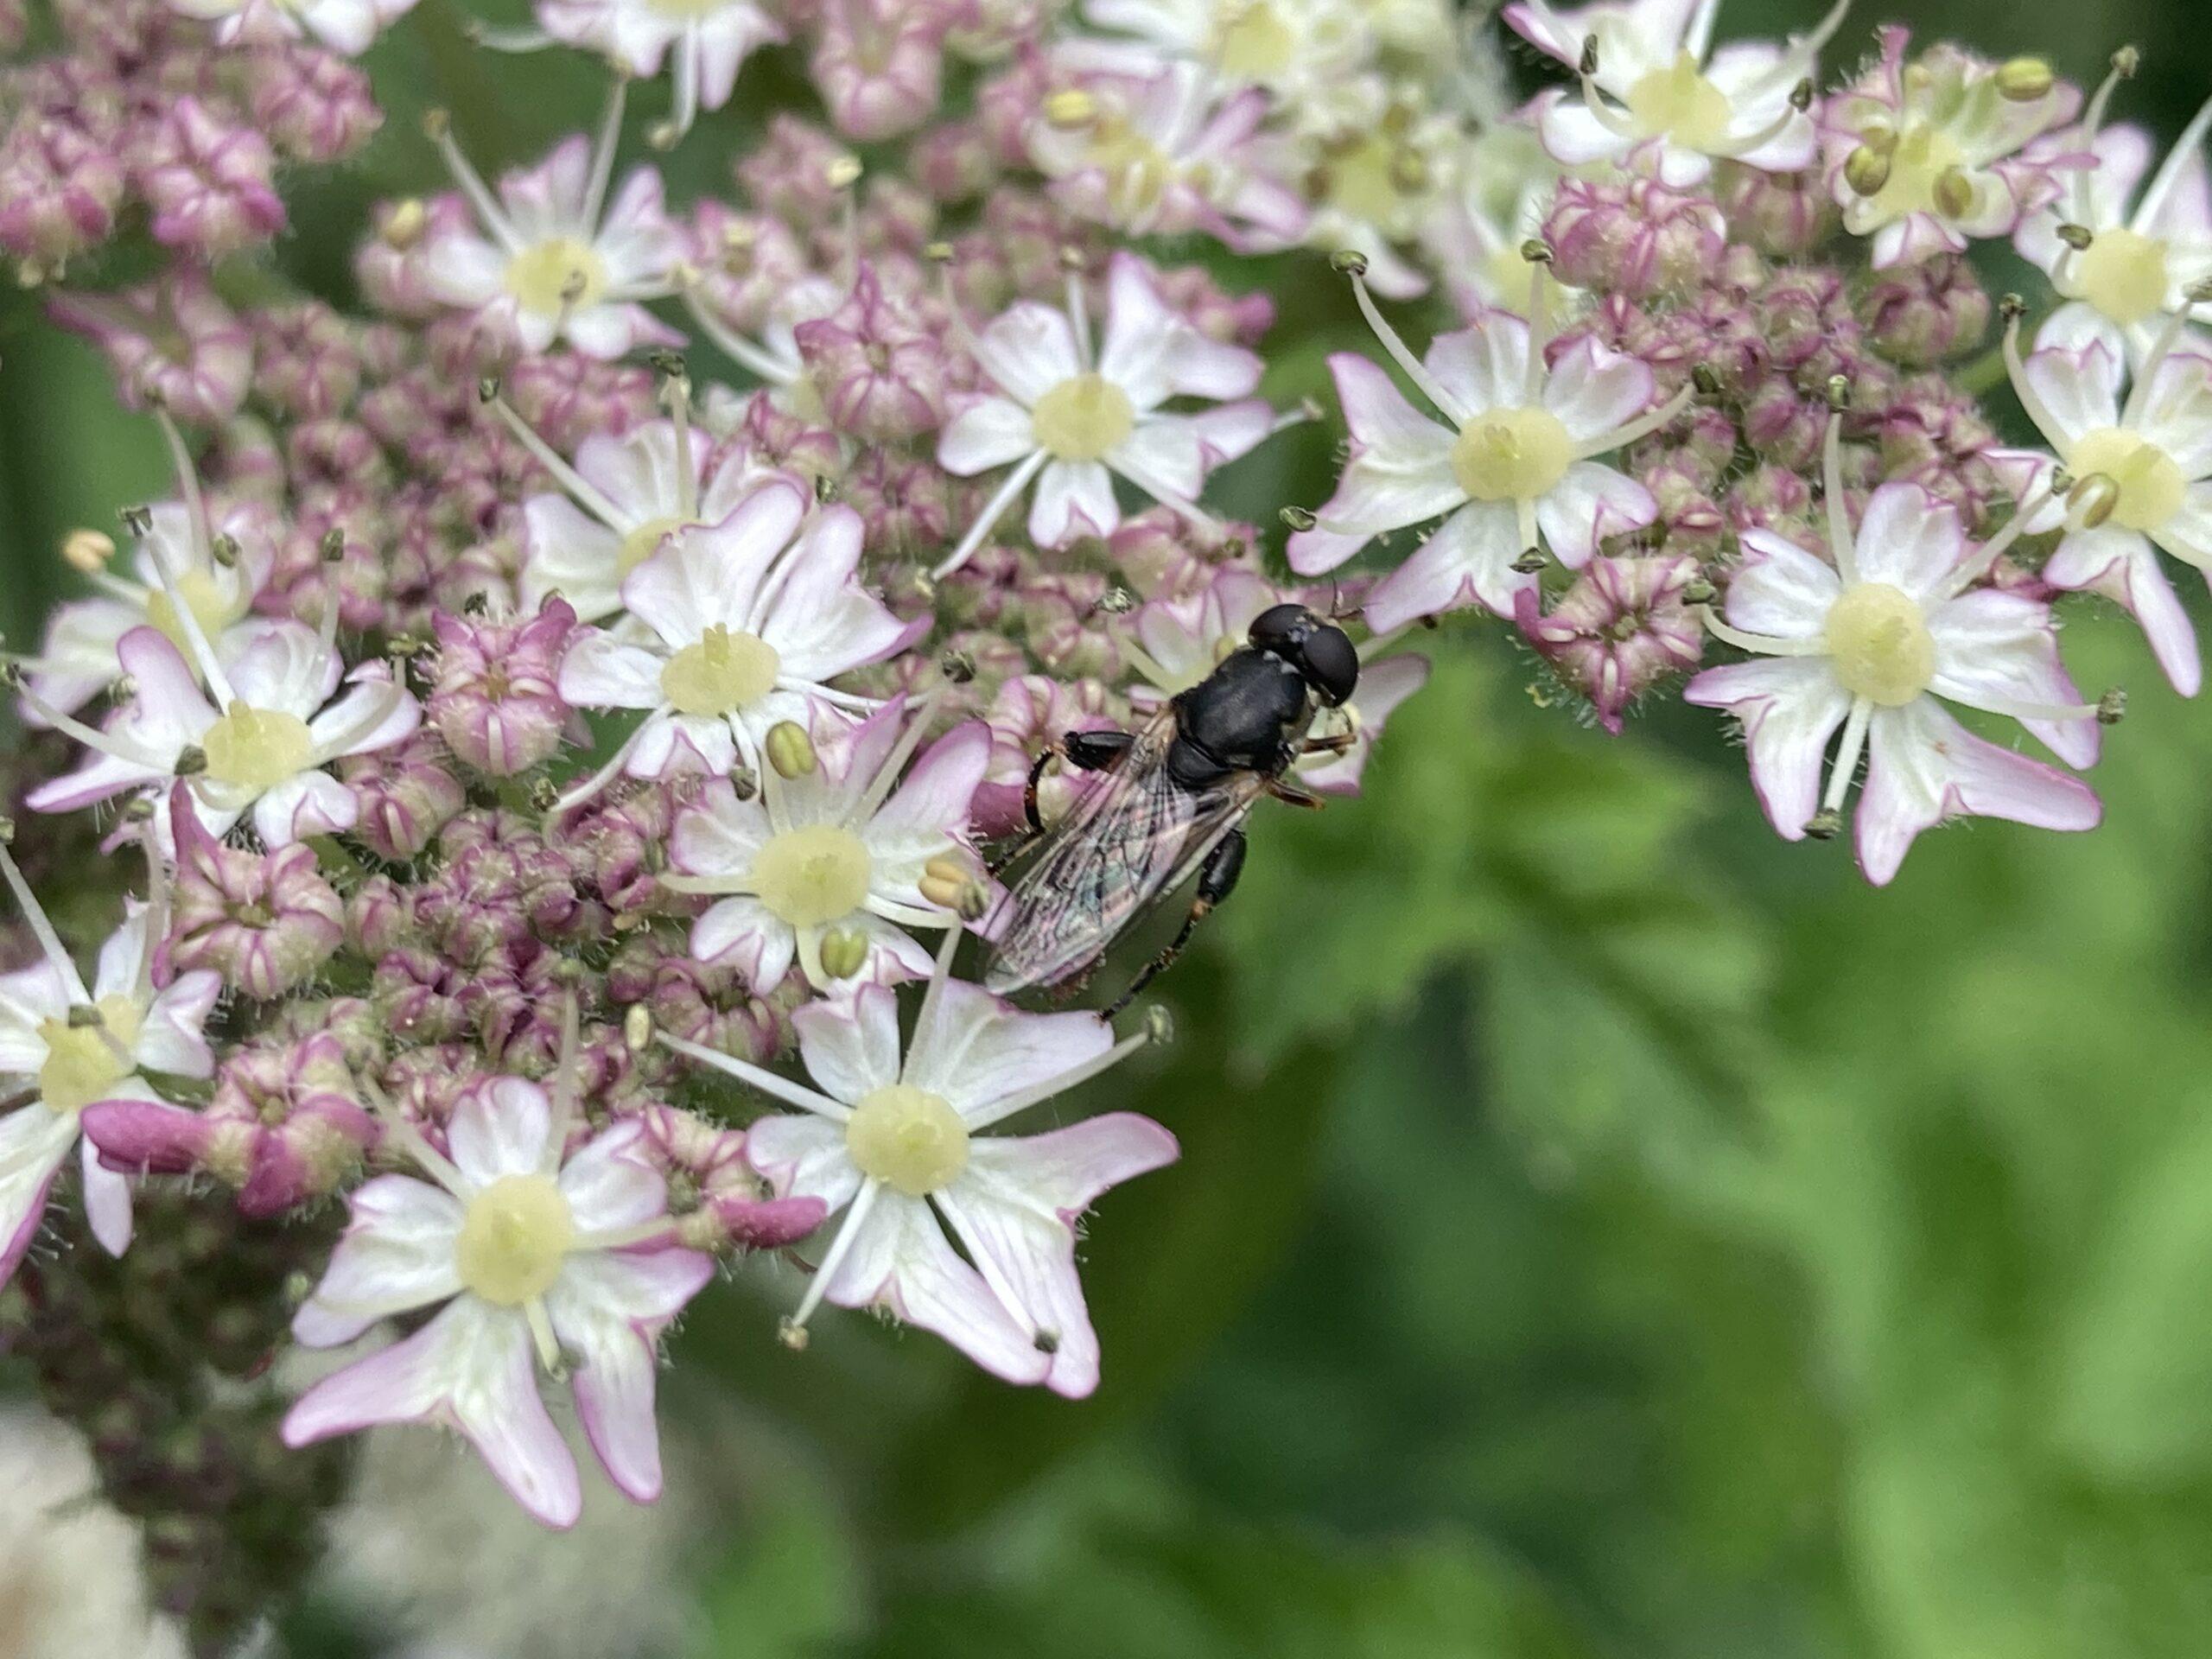 Hoverfly - Cheilosia albitarsis/ranunculi agg